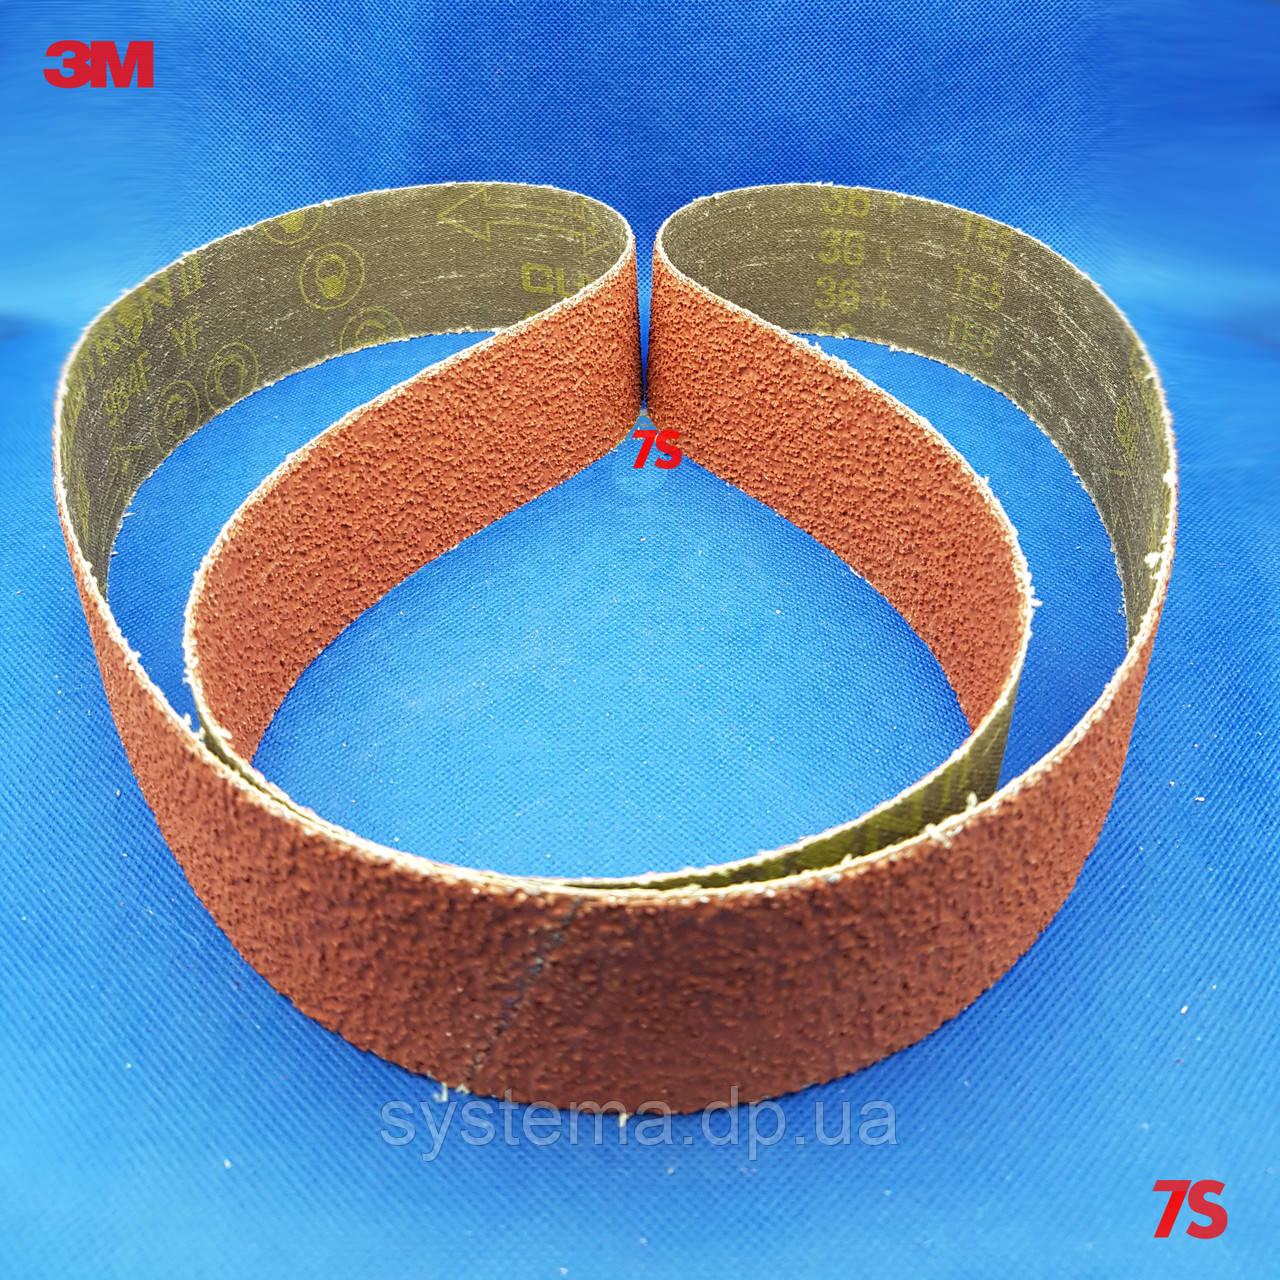 Шлифовальная лента для гриндера 3M™ Cubitron™ II 984F - 50x2000 мм,